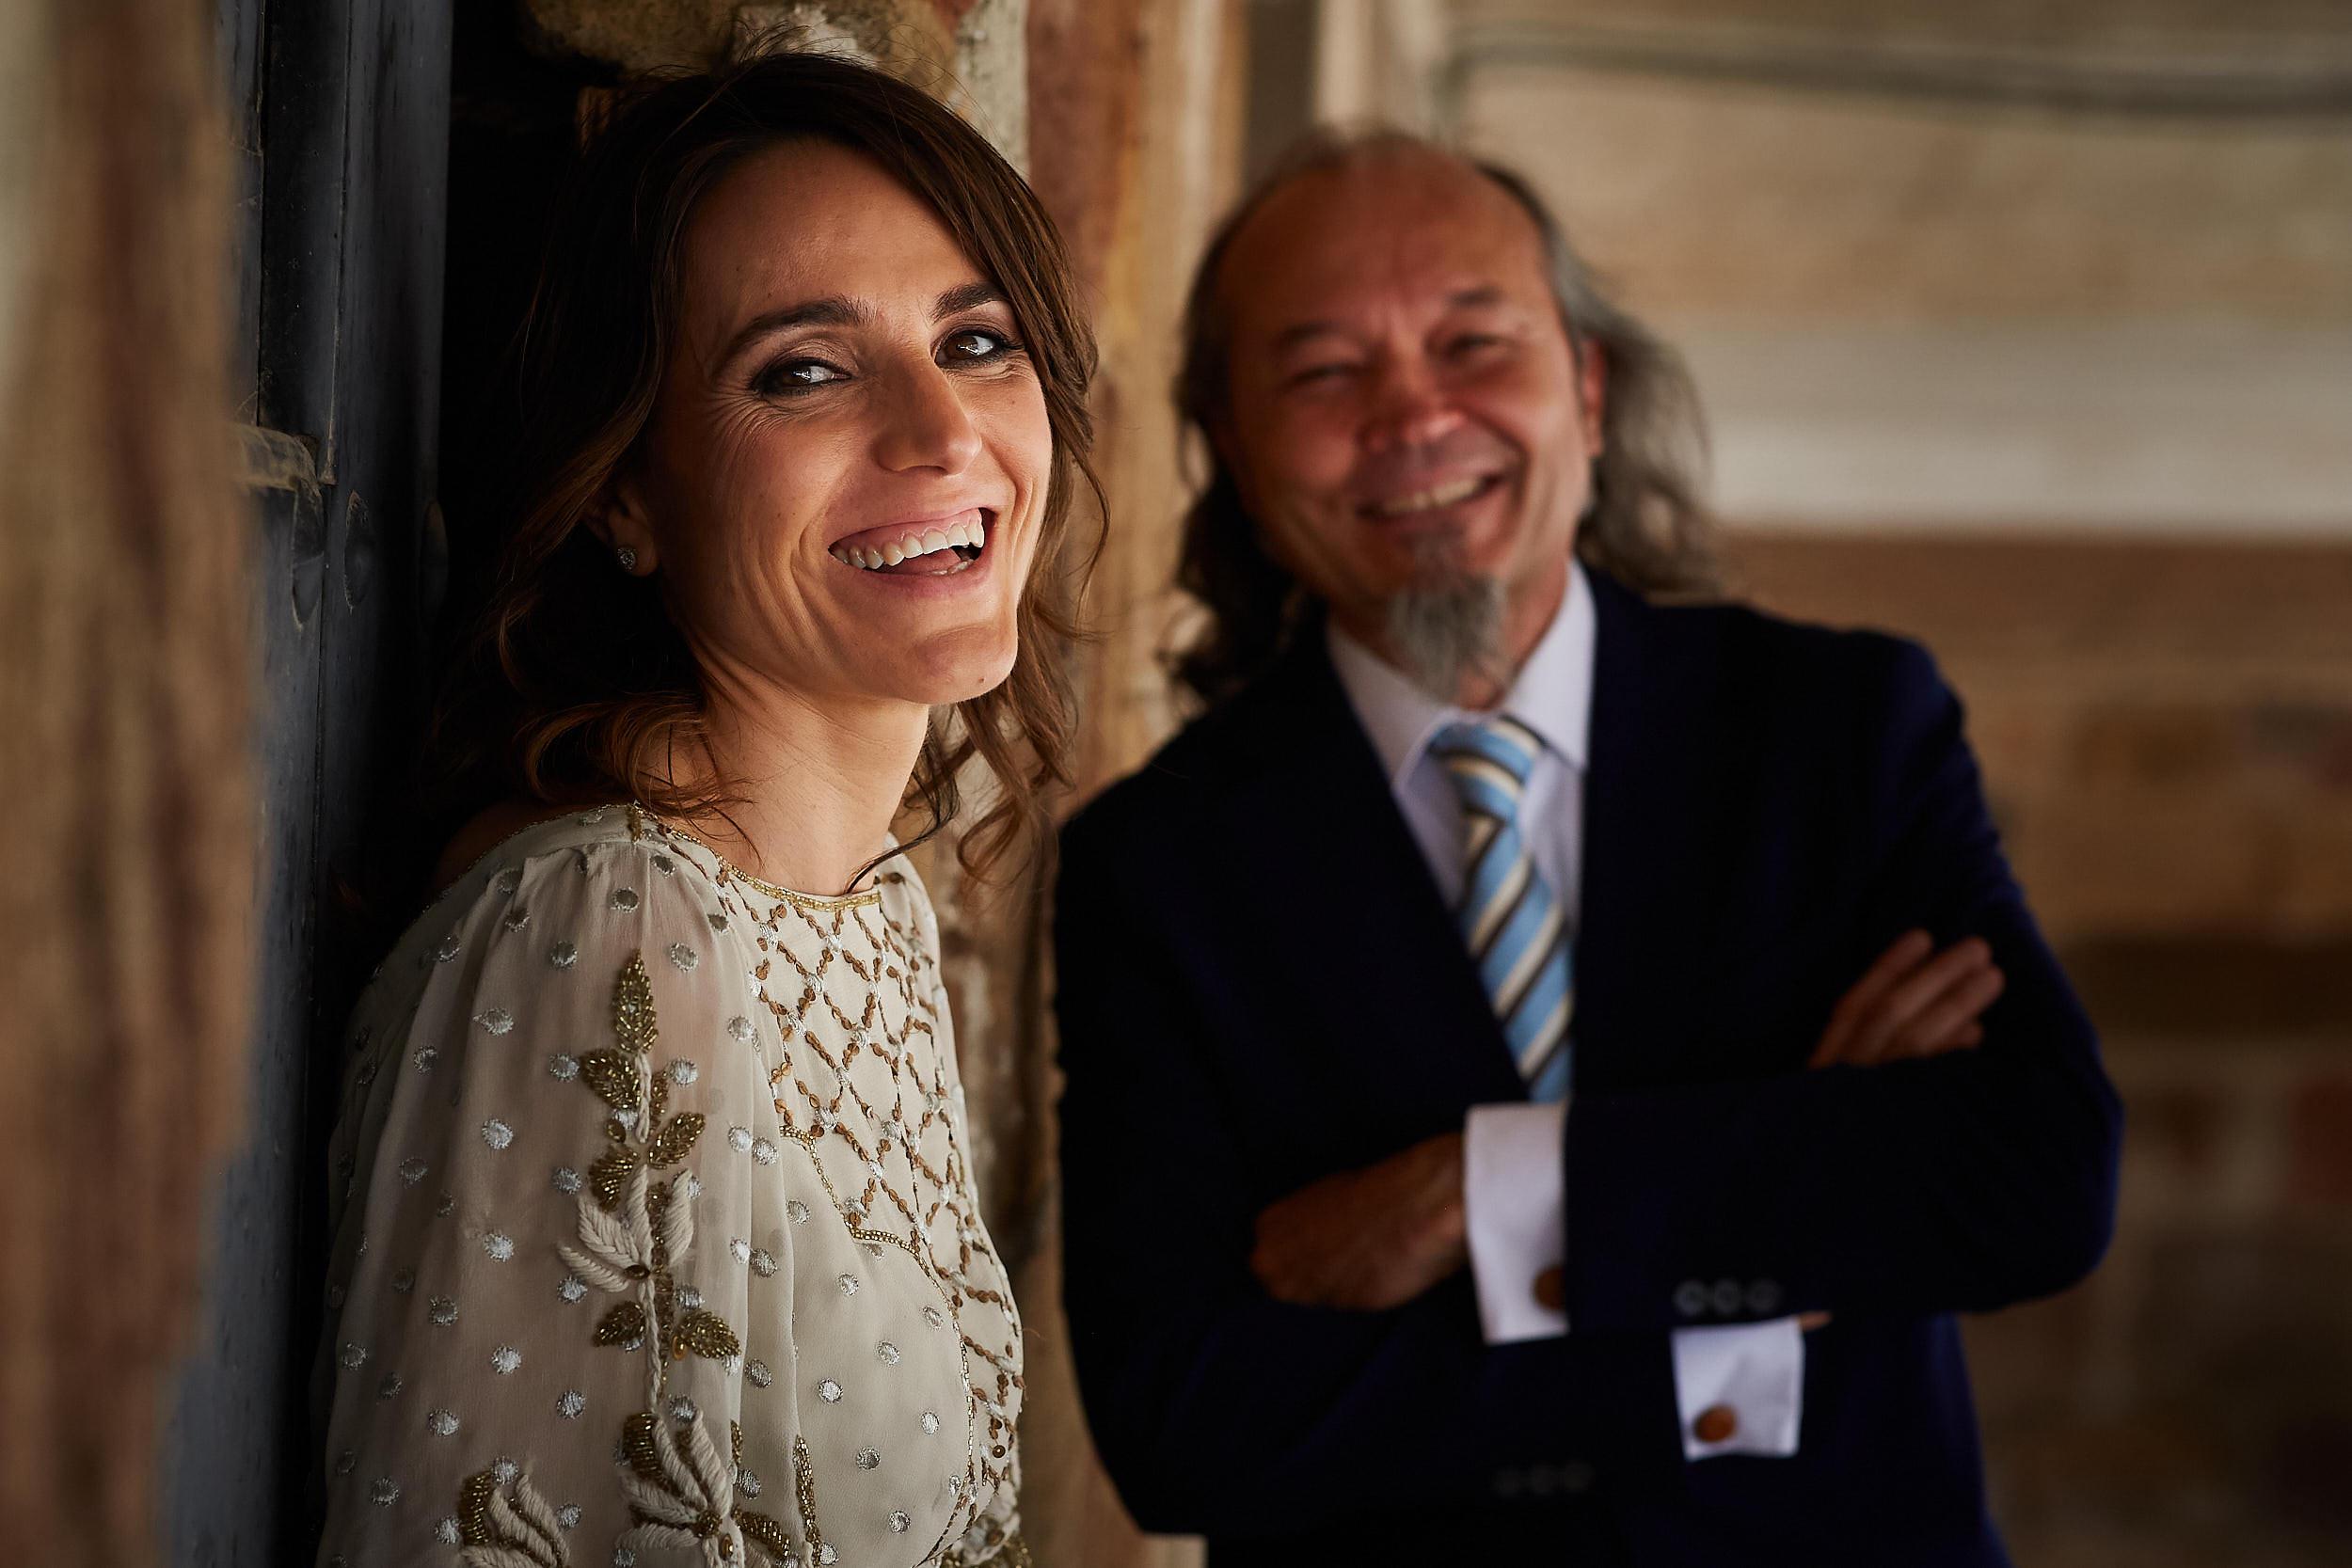 Wedding_Rioja_Basque_Country_Spain_James_Sturcke25.jpg